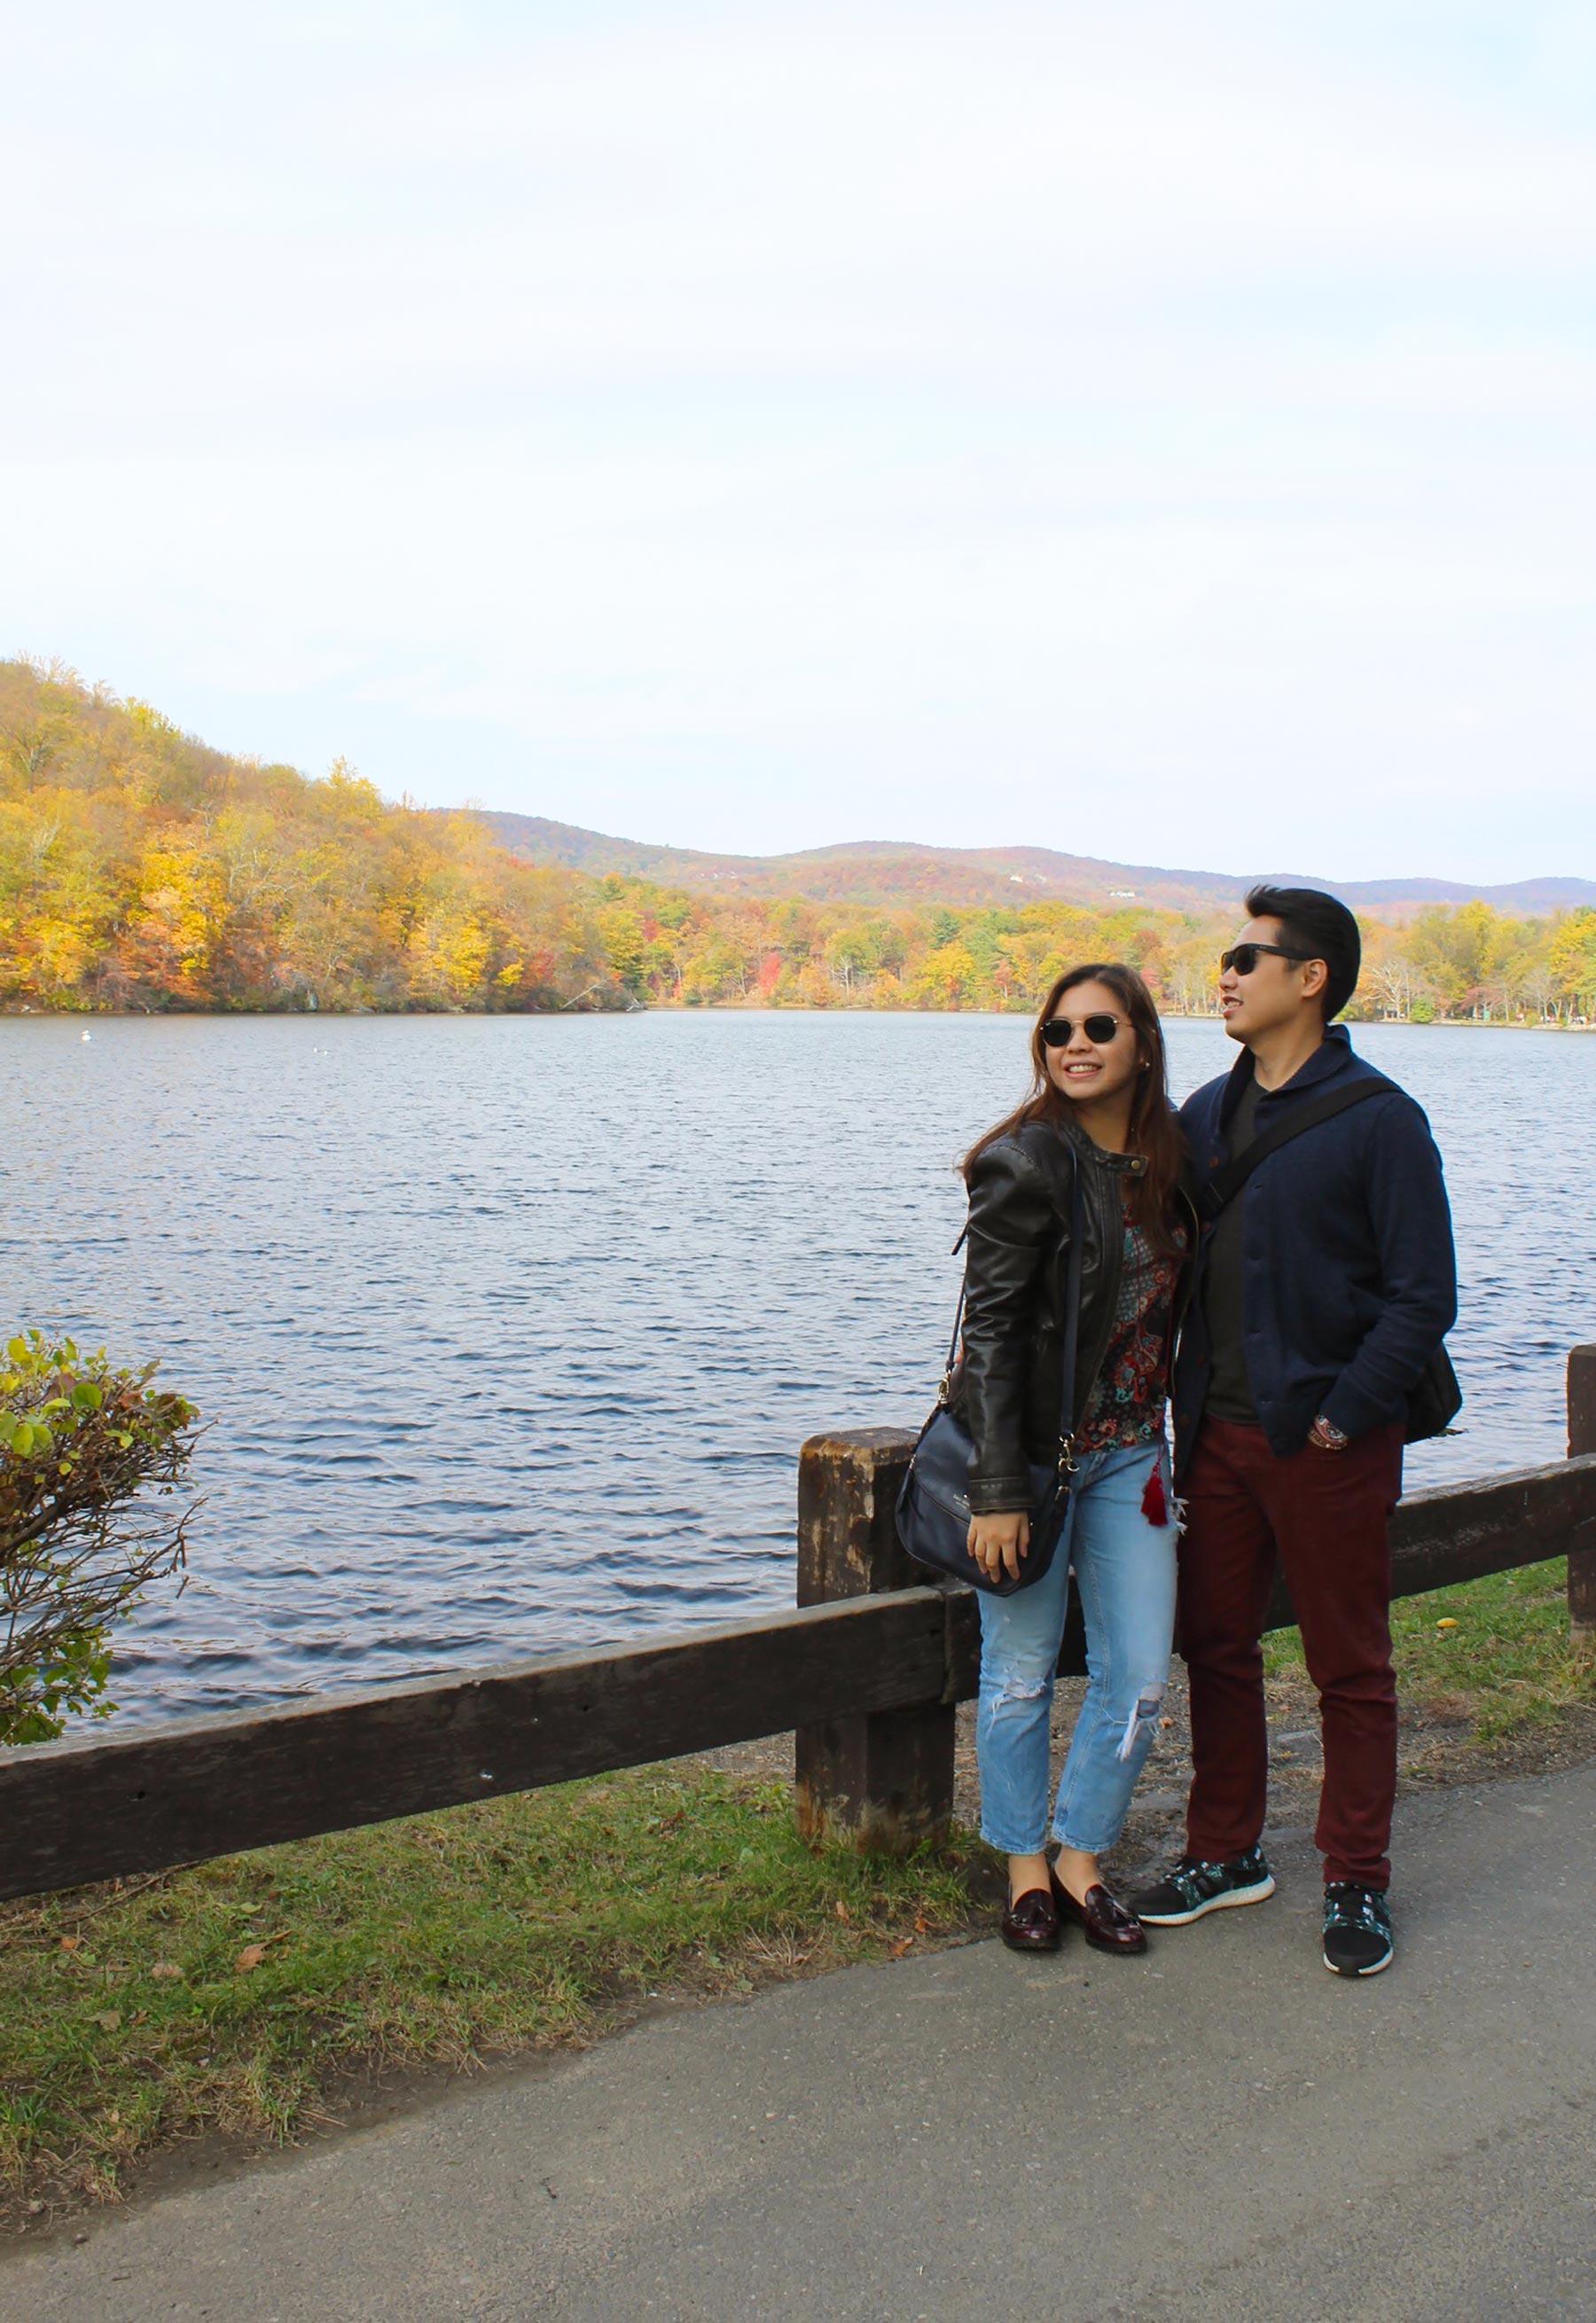 Bear State Park, New York - PearlMargaret.com